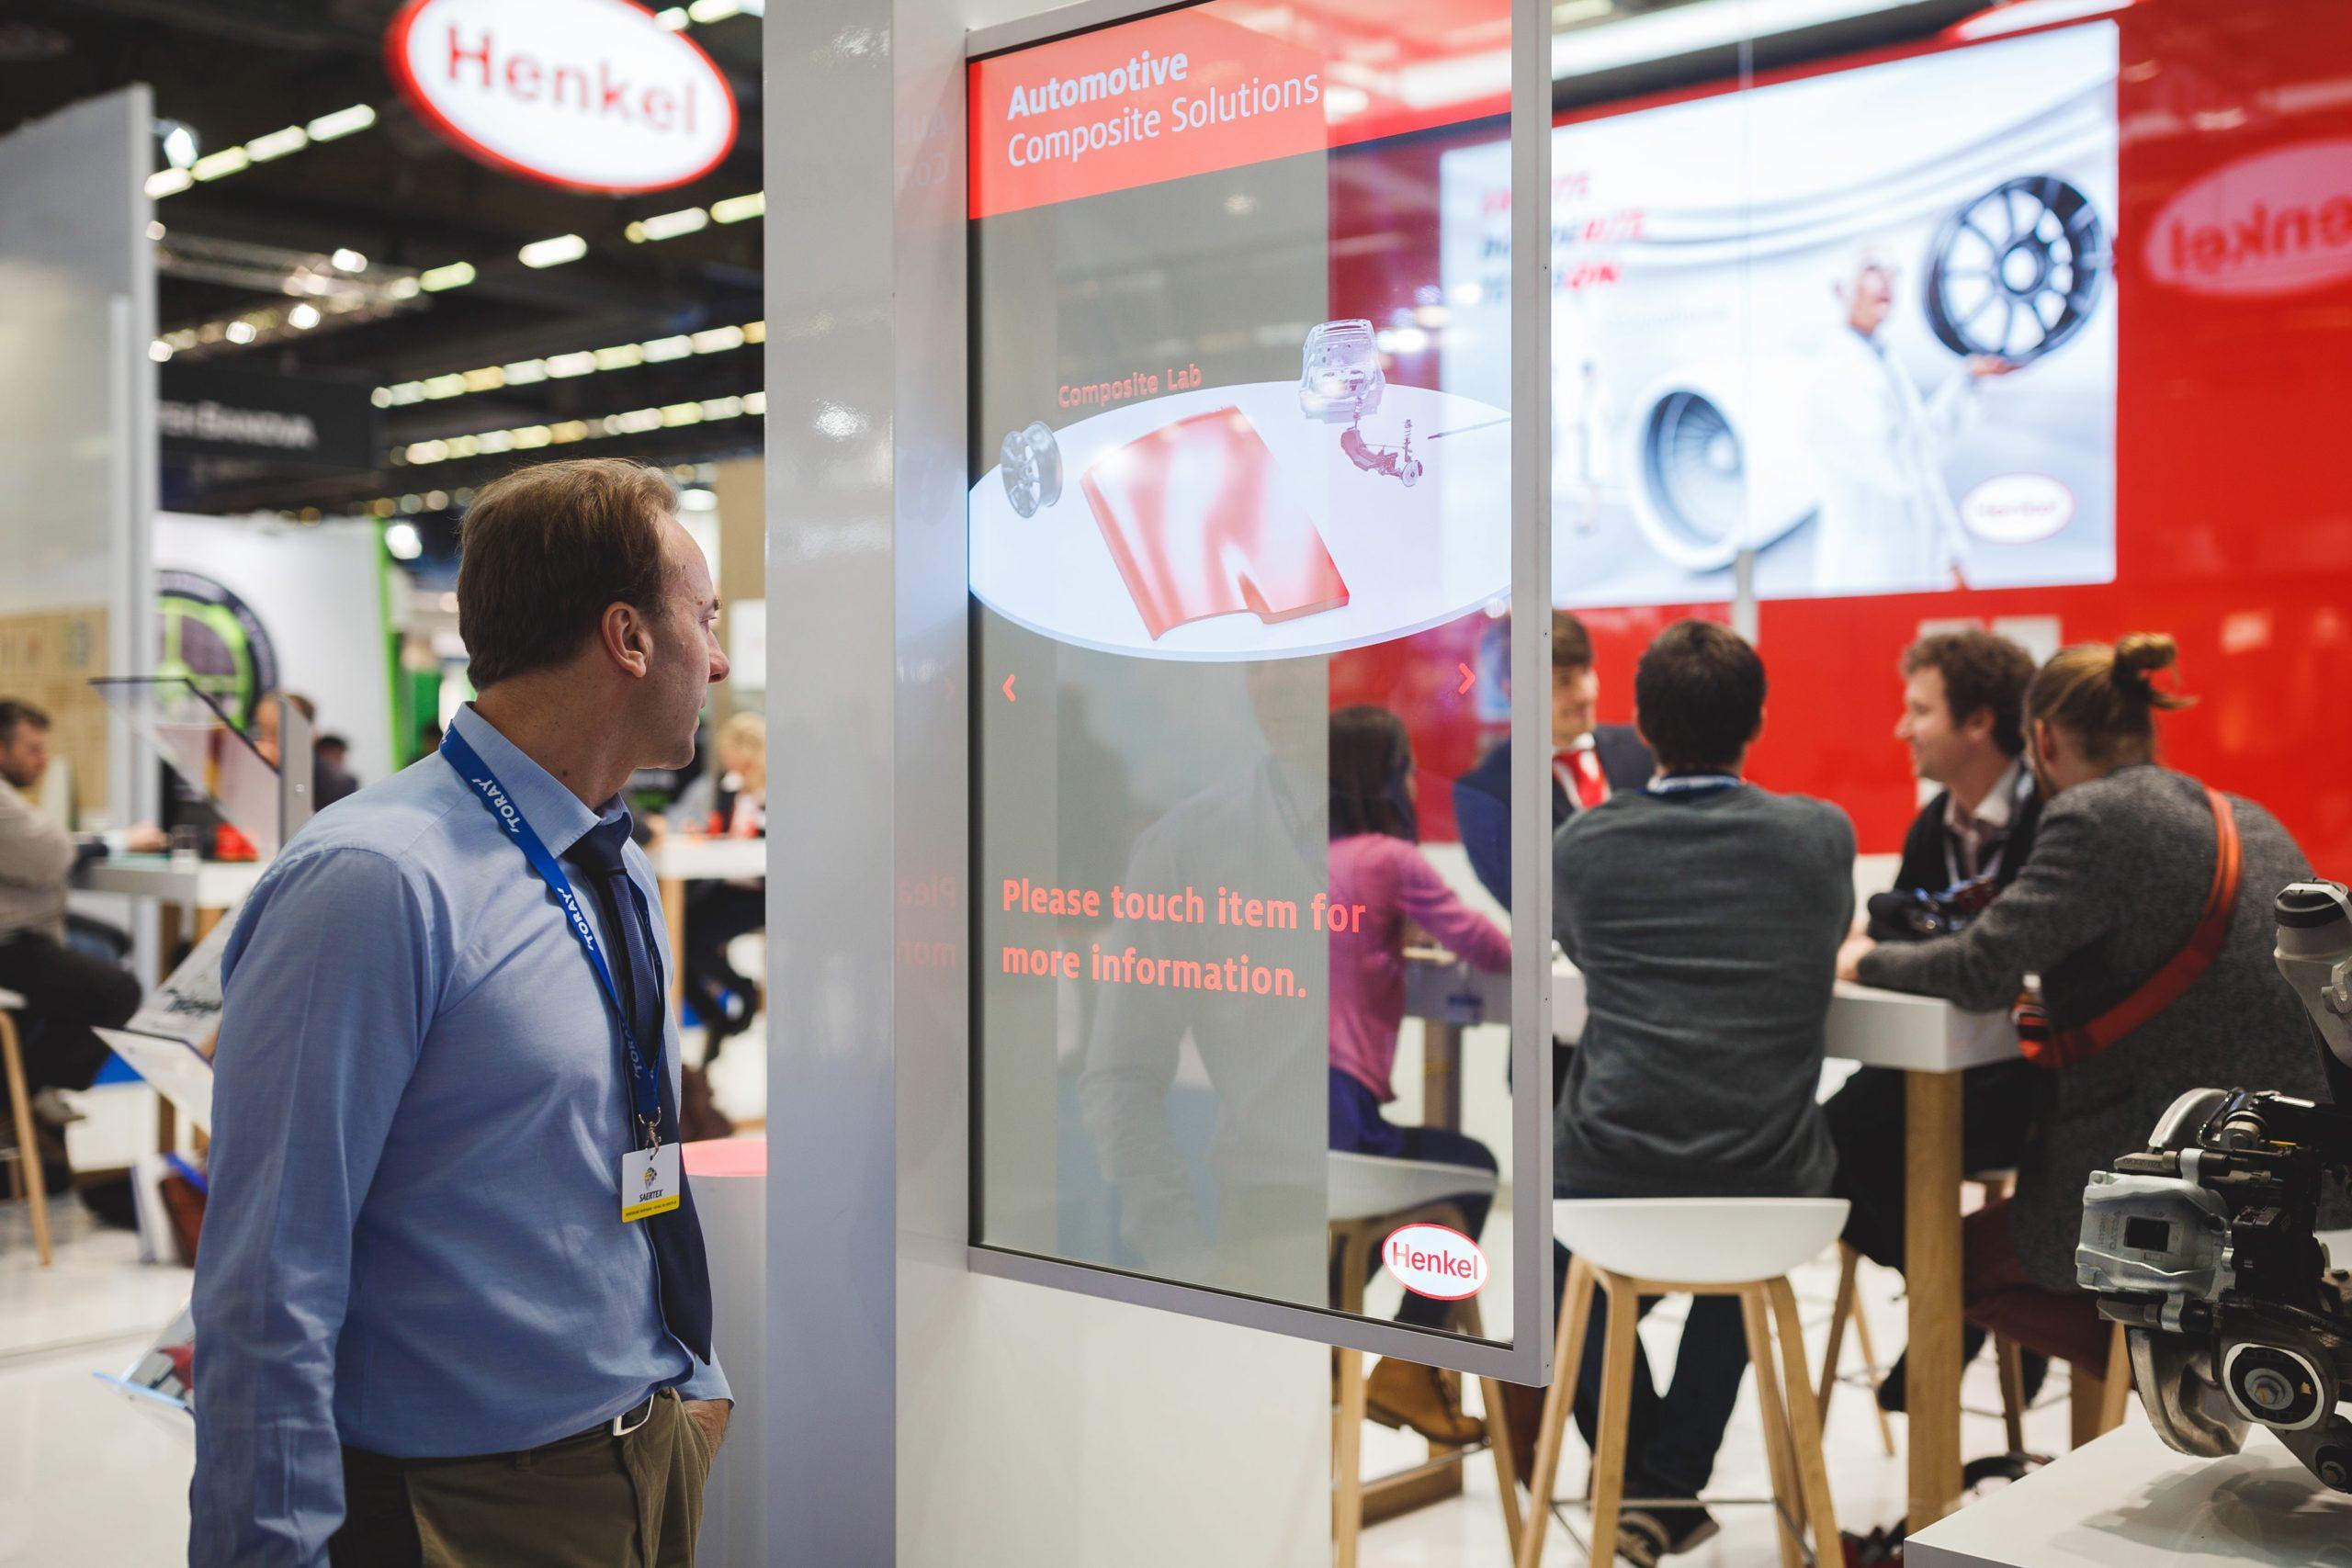 henkel booth OLED screen customer